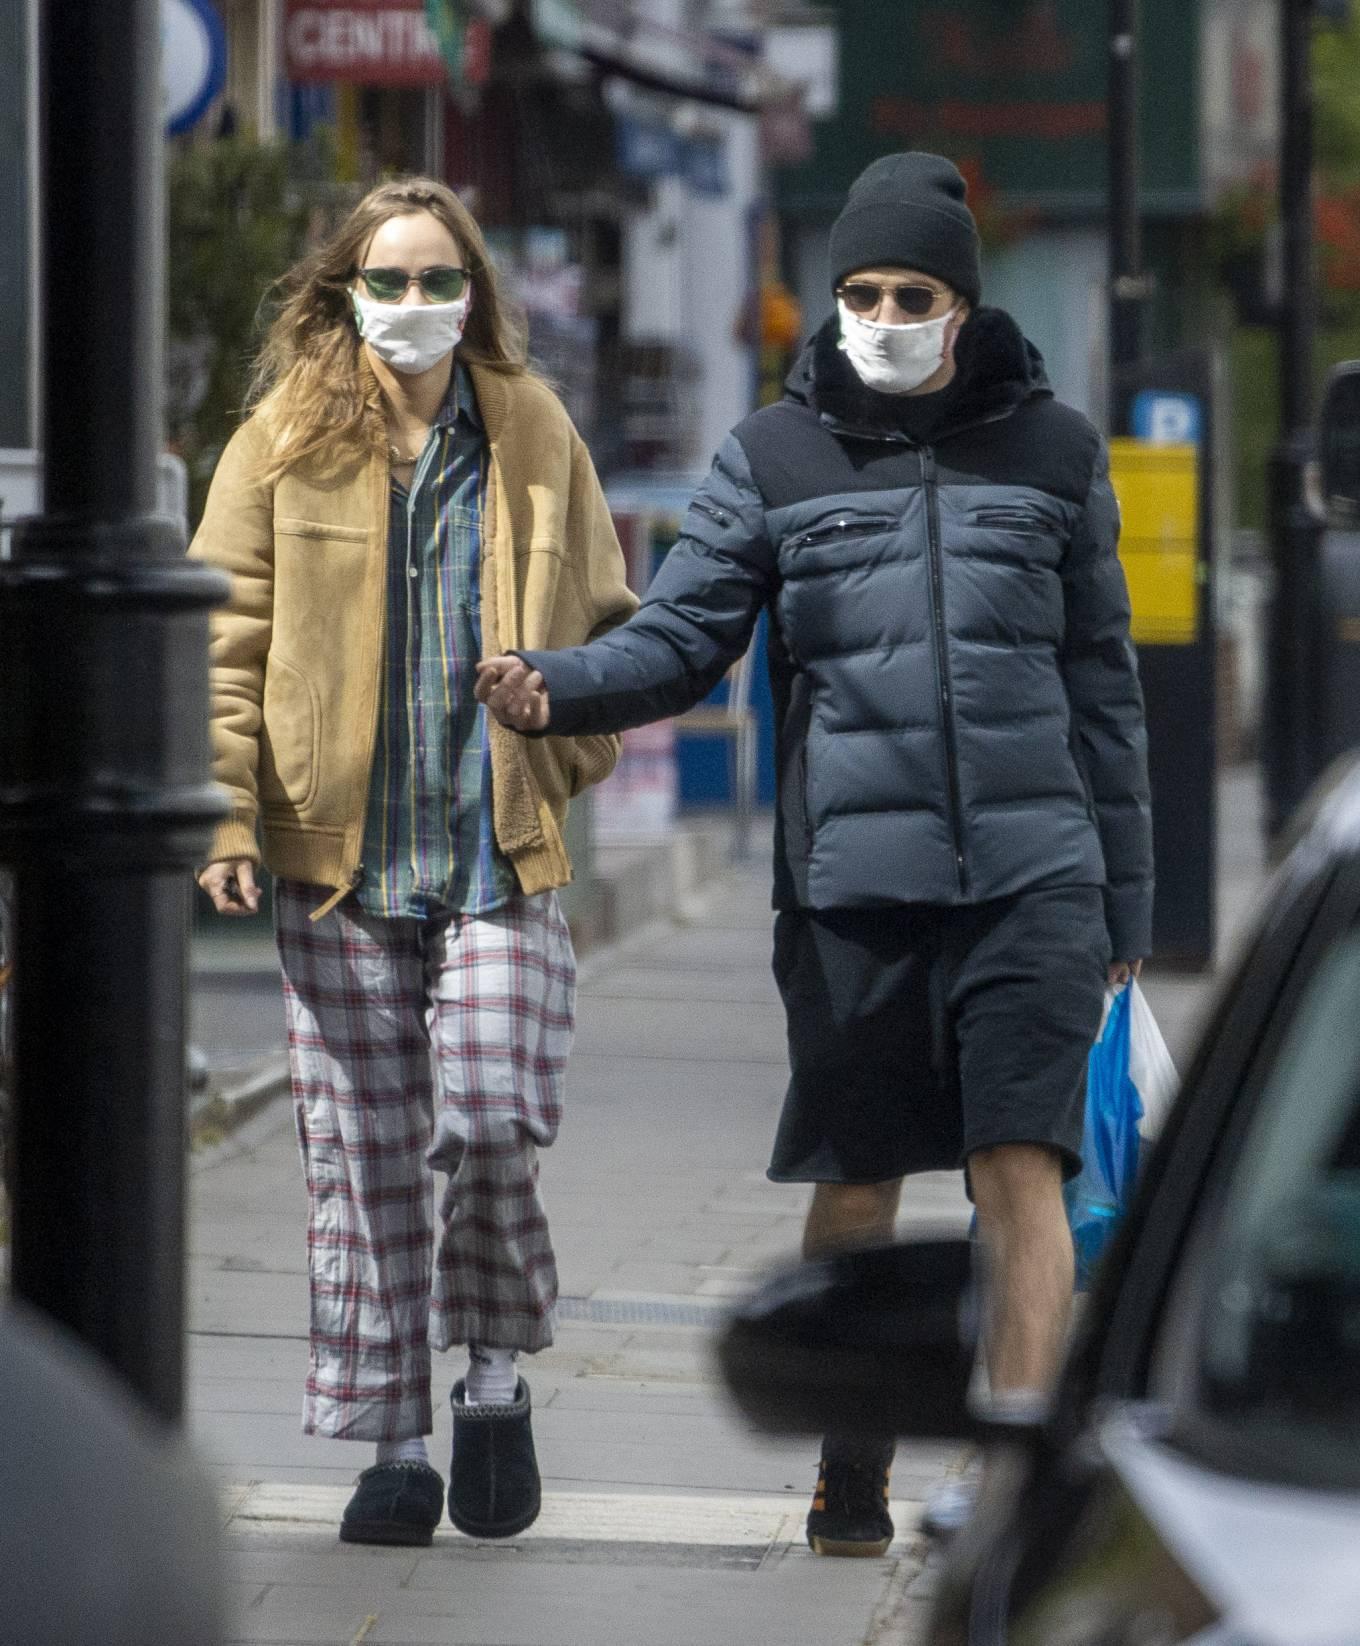 Suki Waterhouse 2020 : Suki Waterhouse and Robert Pattinson – Wearing matching face masks in London-06